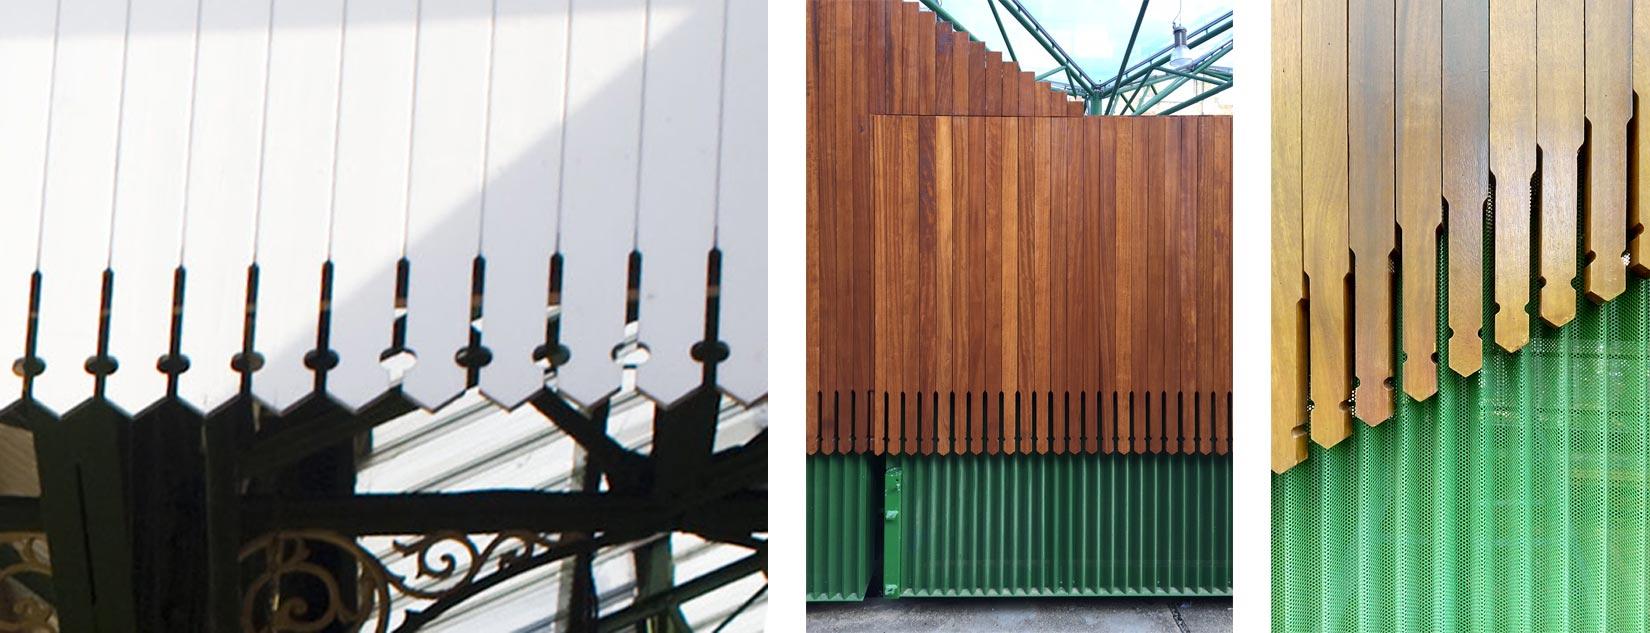 Jubilee Place, Borough Market, London, Elevation, Inspiration & Details